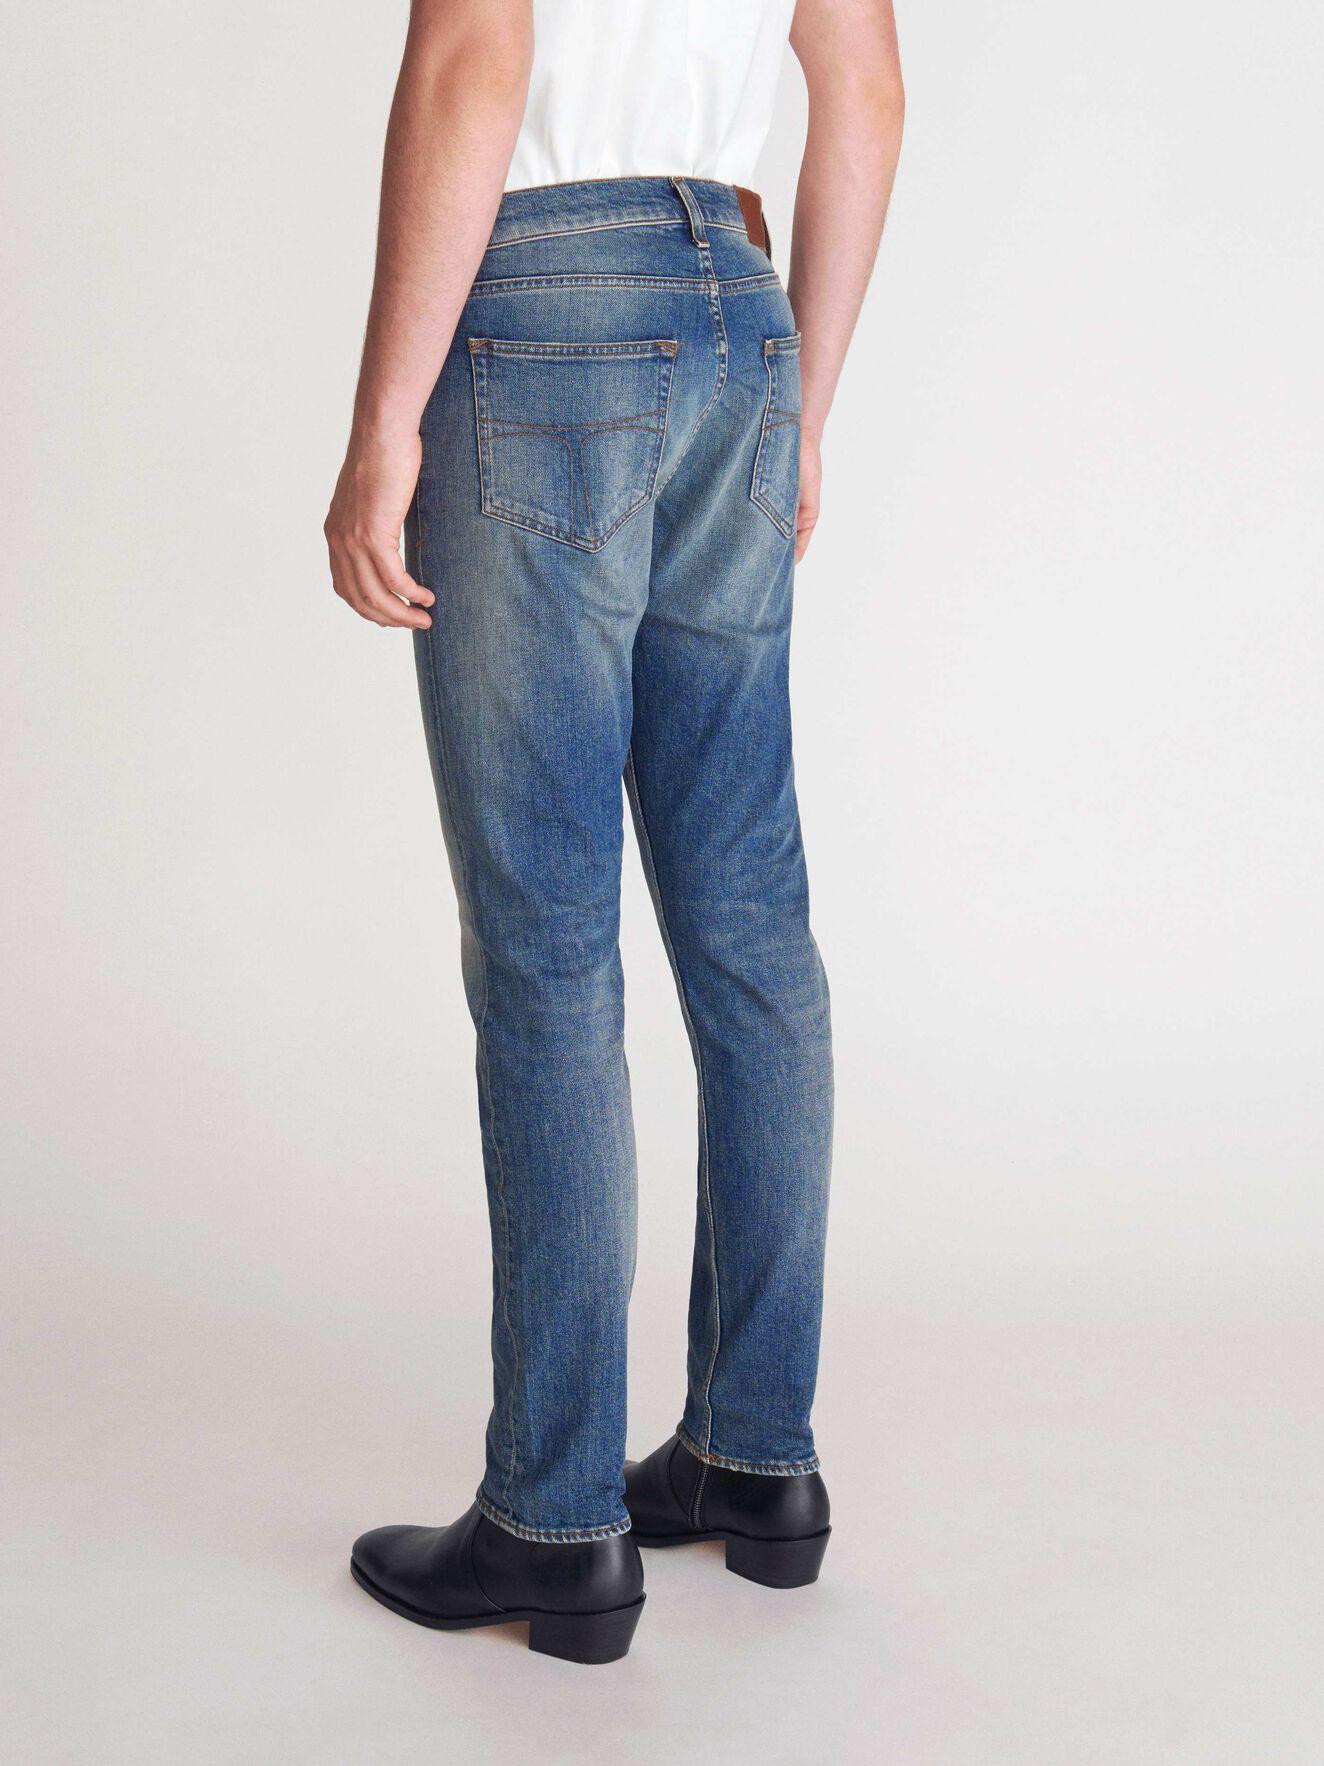 Pistolero jeans in Dust blue from Tiger of Sweden